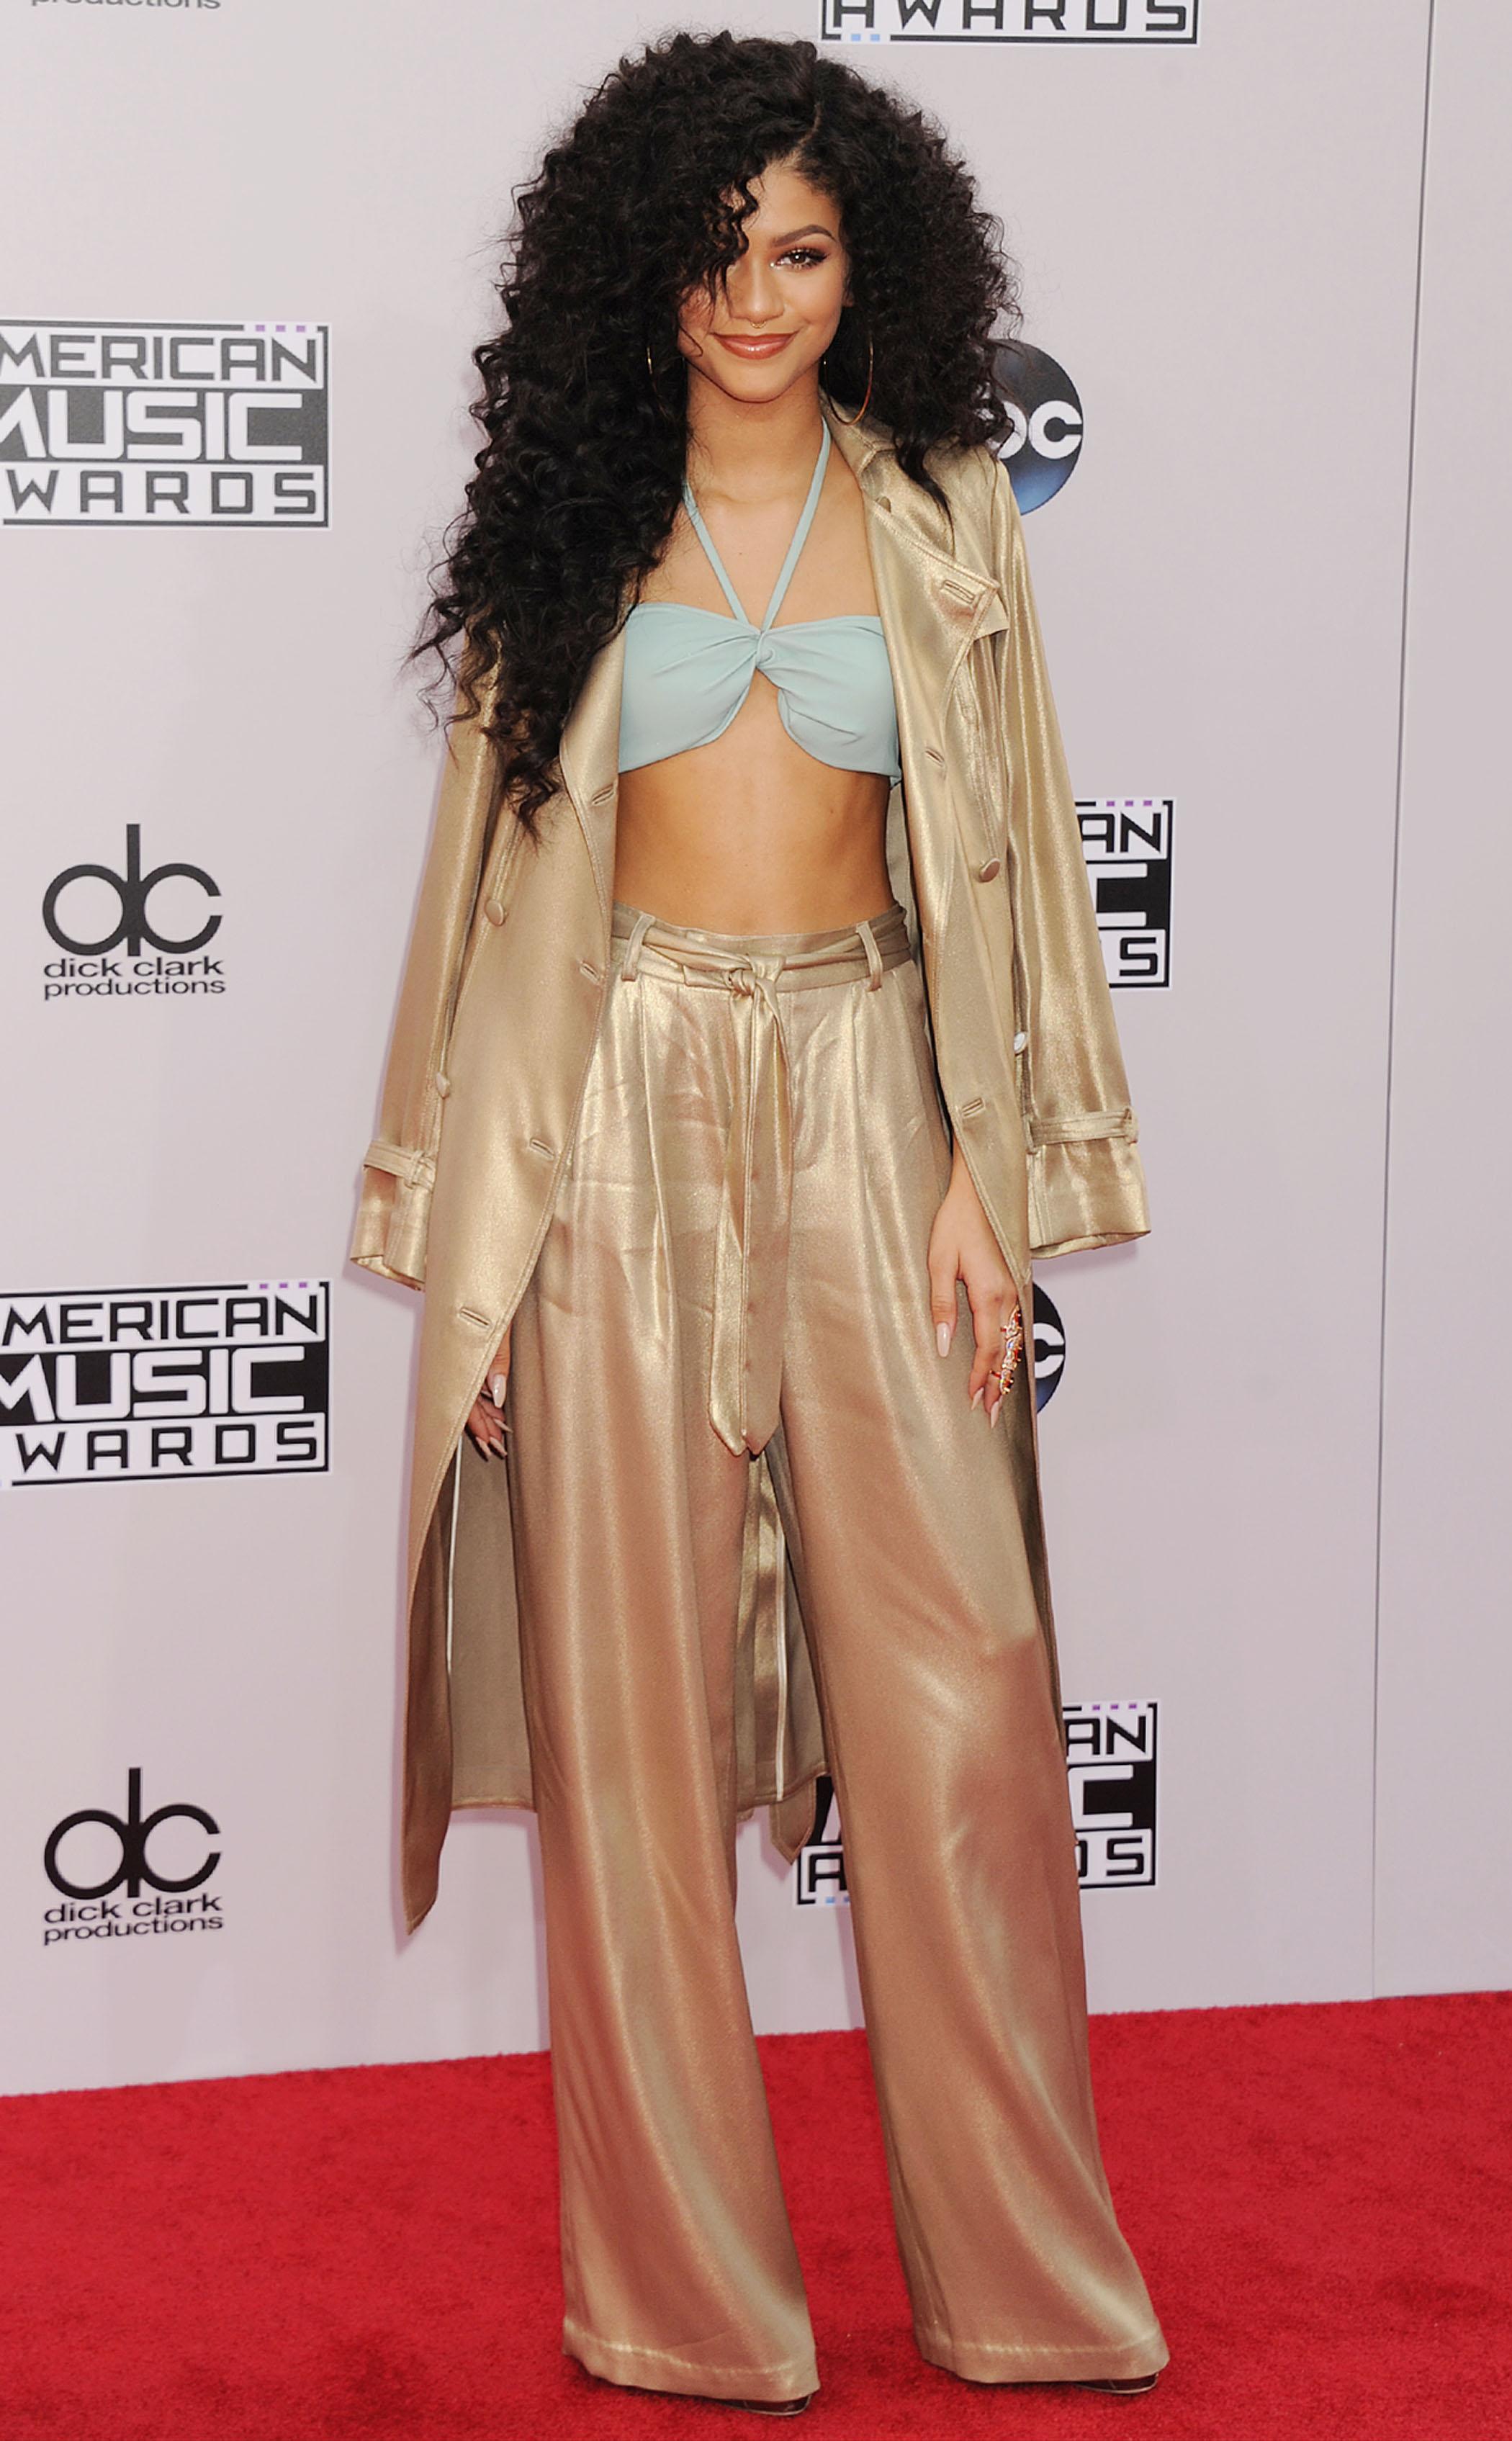 zendaya-coleman-georgine-2014-american-music-awards/